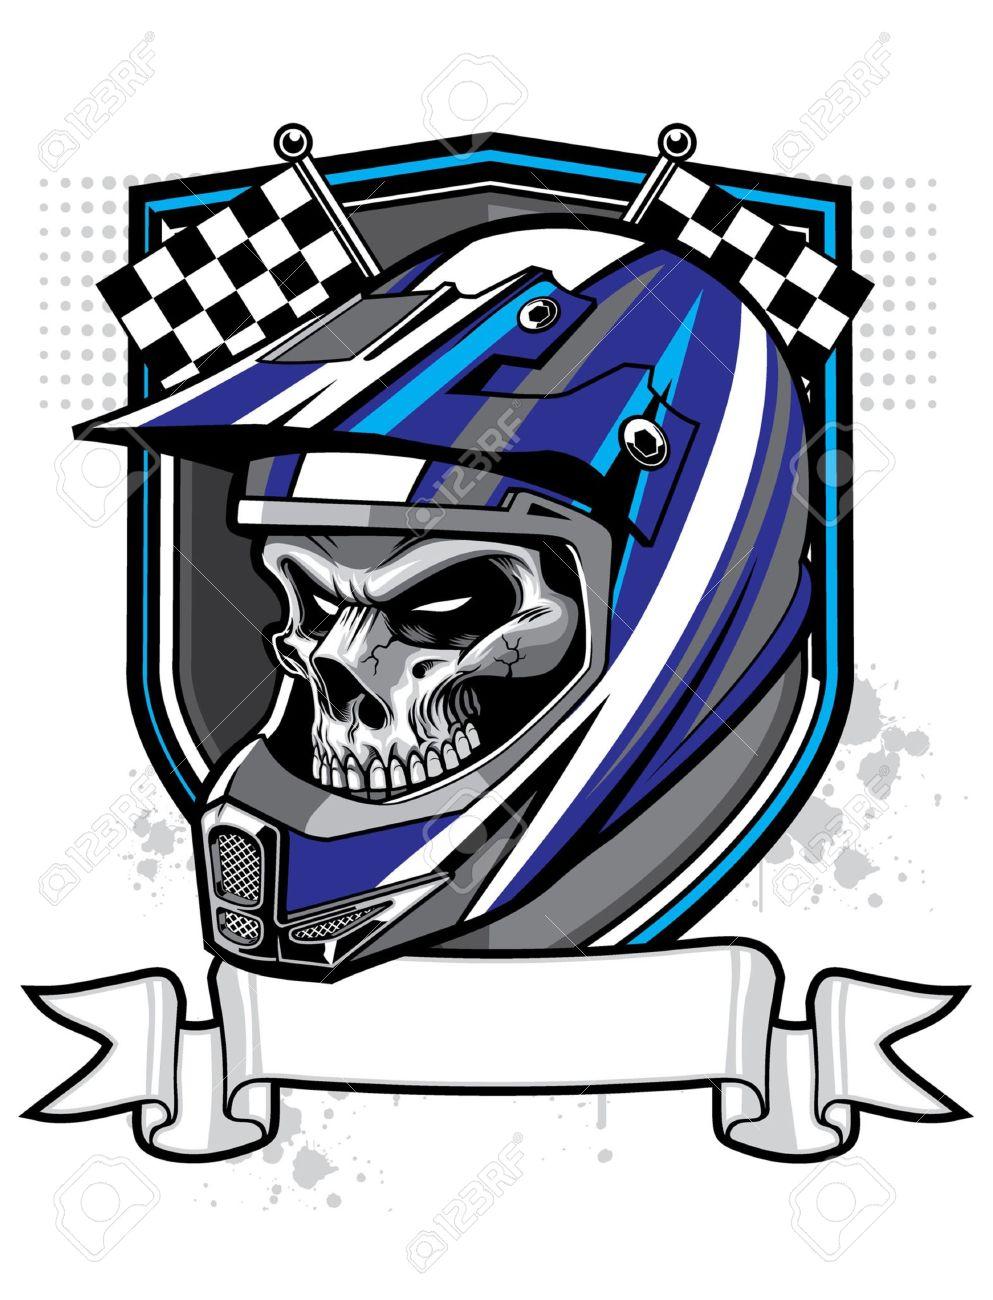 vector skull wearing trail helmet and banner - 18727063